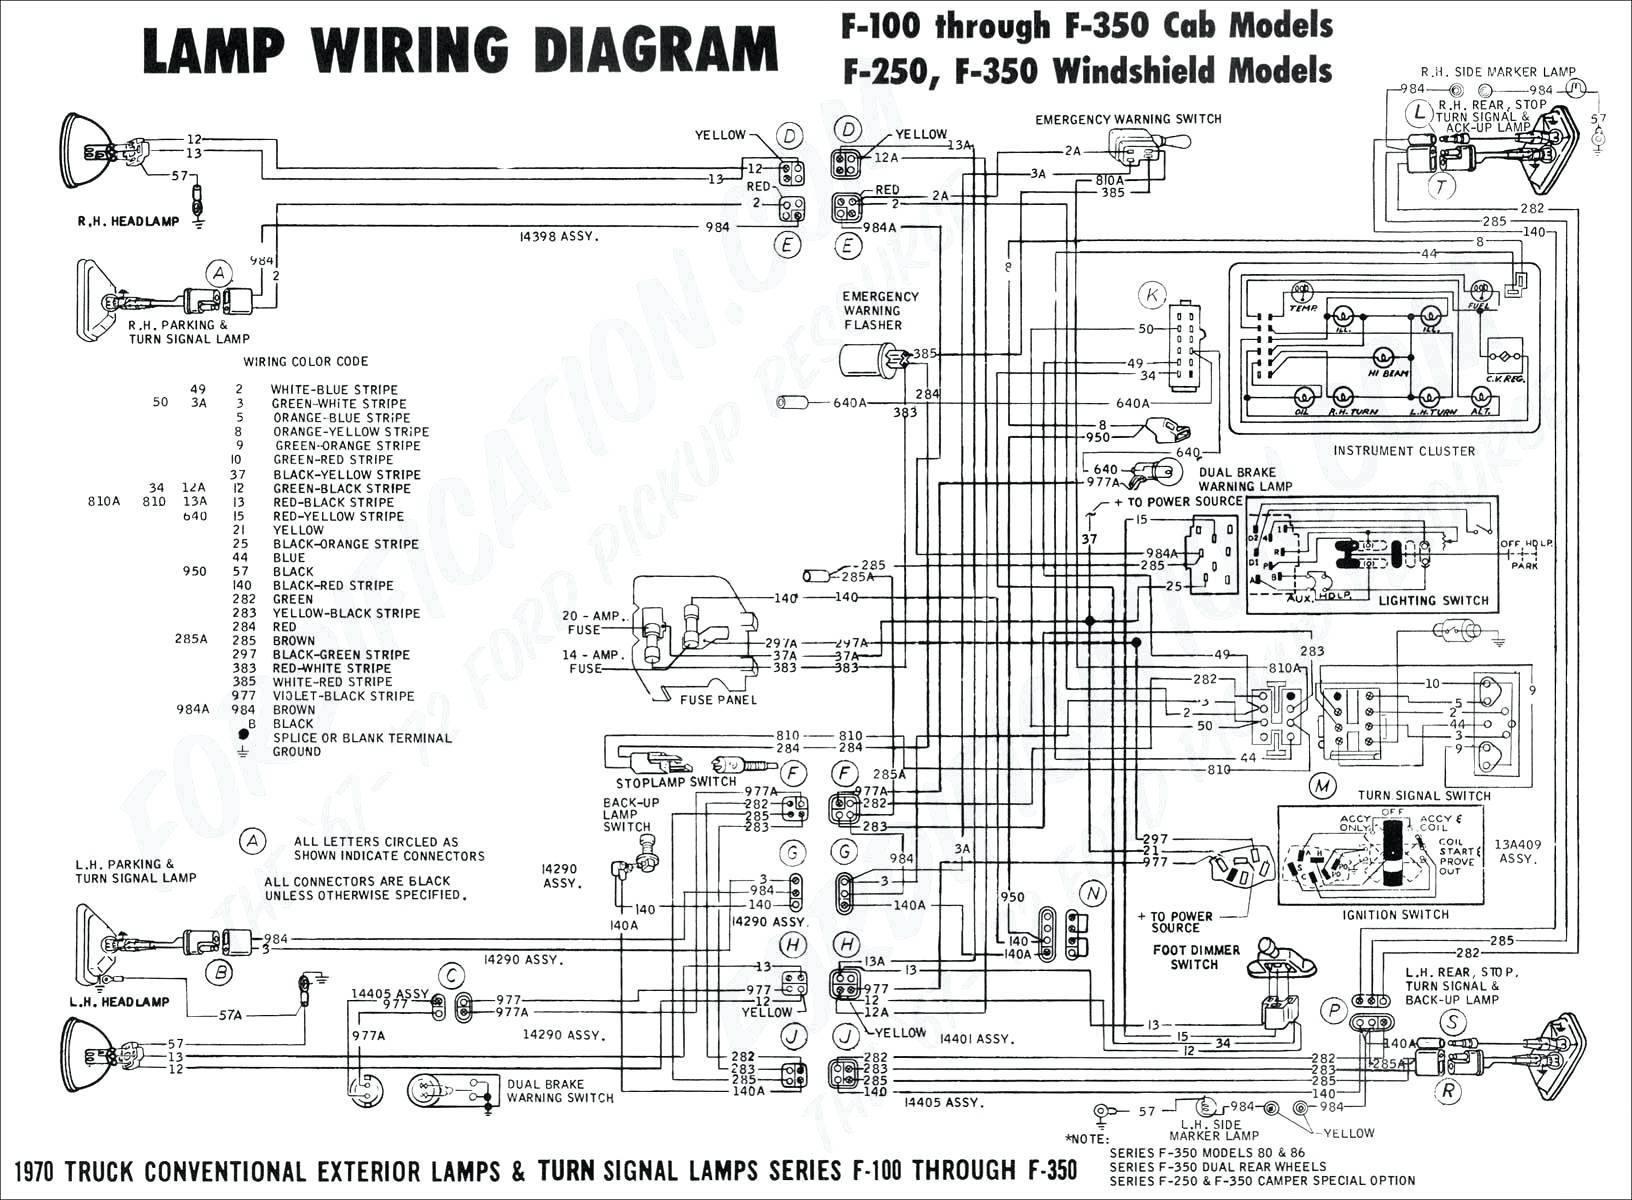 2005 Chevy Equinox Wiring Diagram 2006 Tahoe Wiring Diagram Experts Wiring Diagram • Of 2005 Chevy Equinox Wiring Diagram